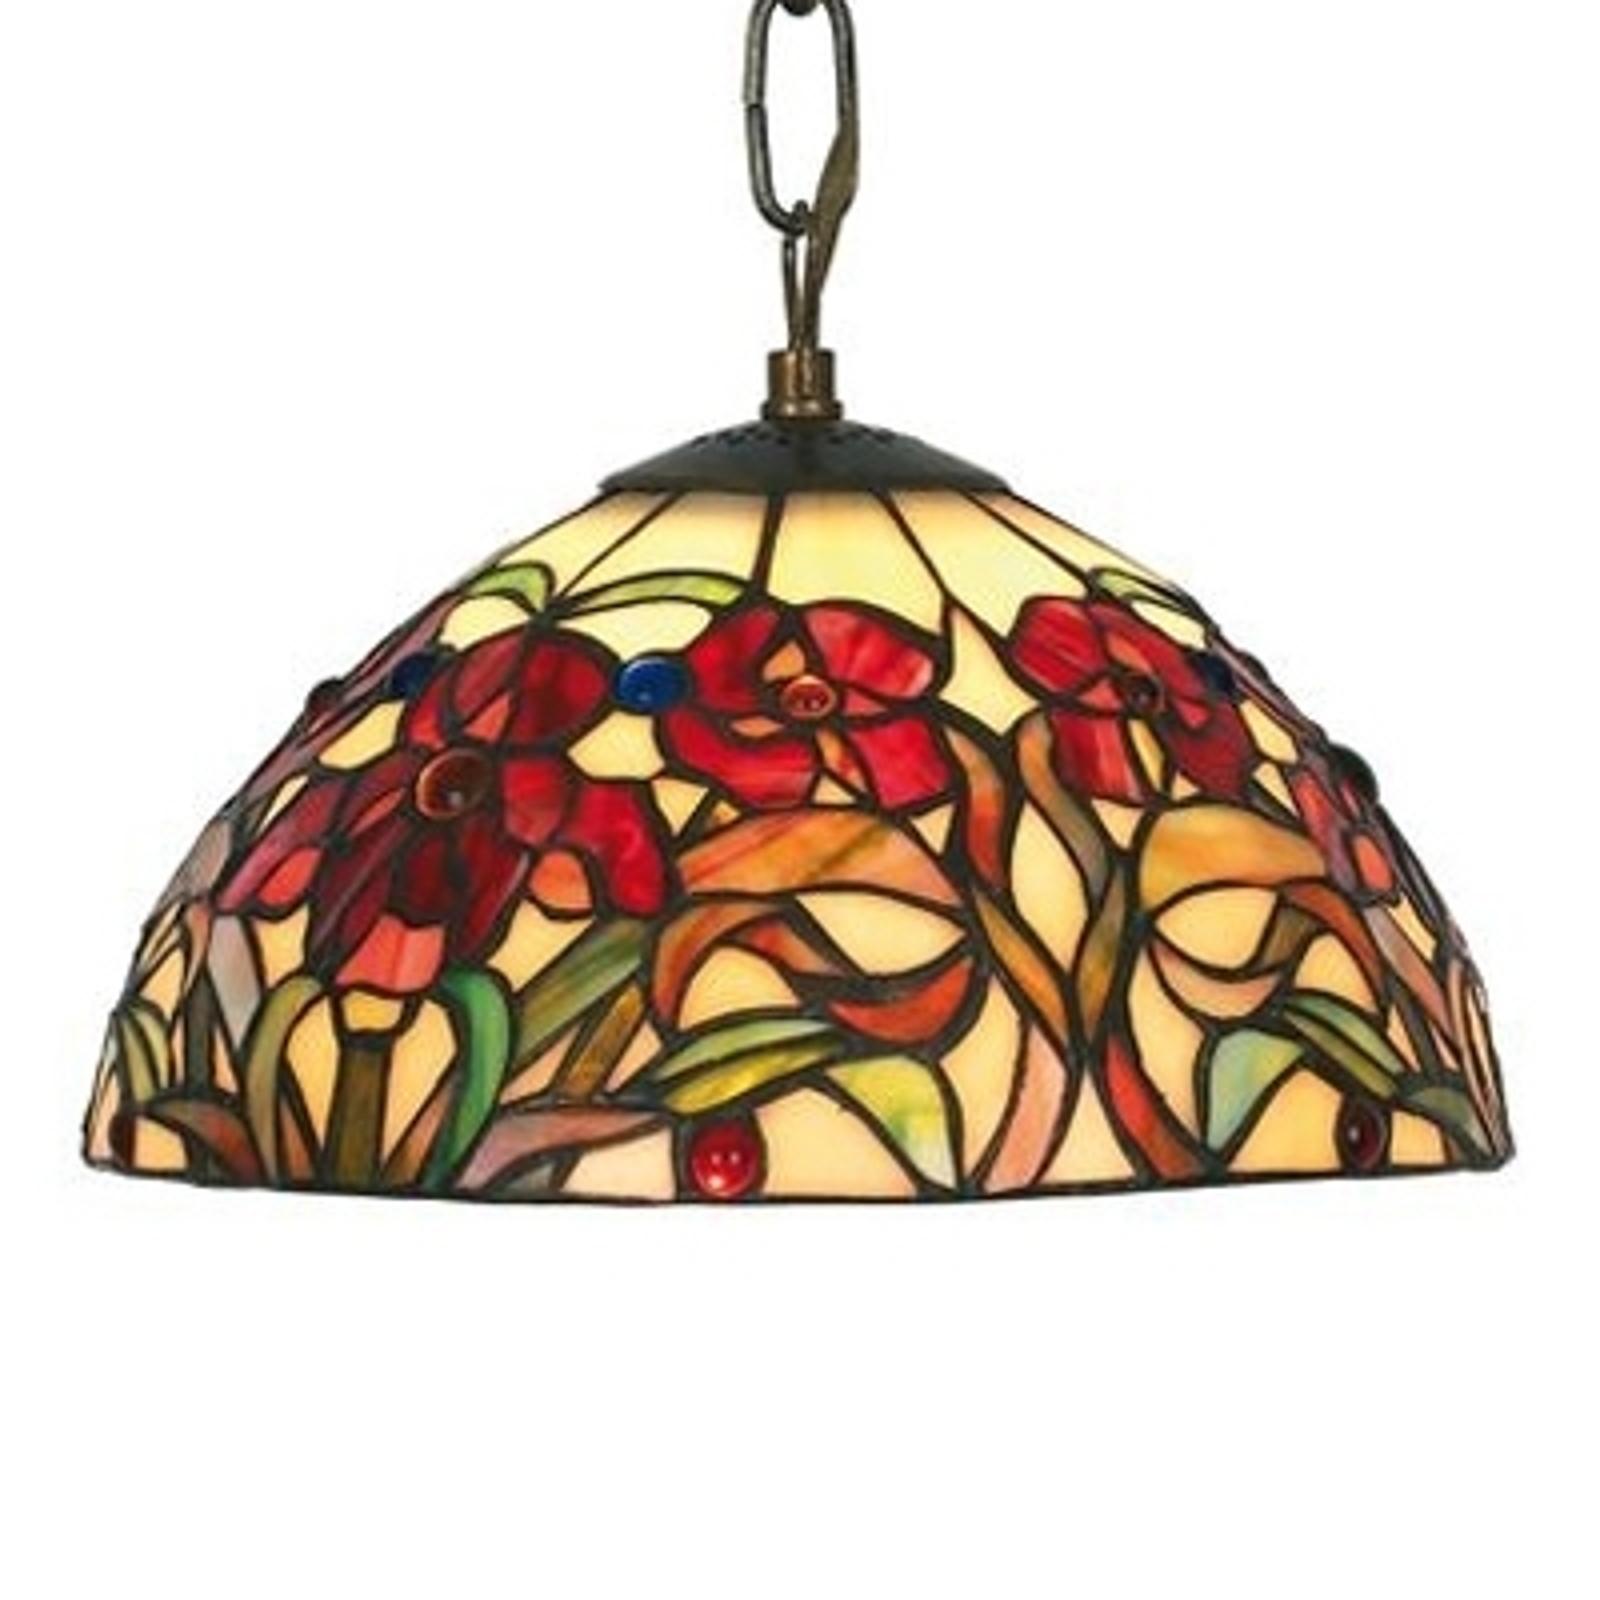 Malá závesná lampa Eline v štýle Tiffany_1032168_1